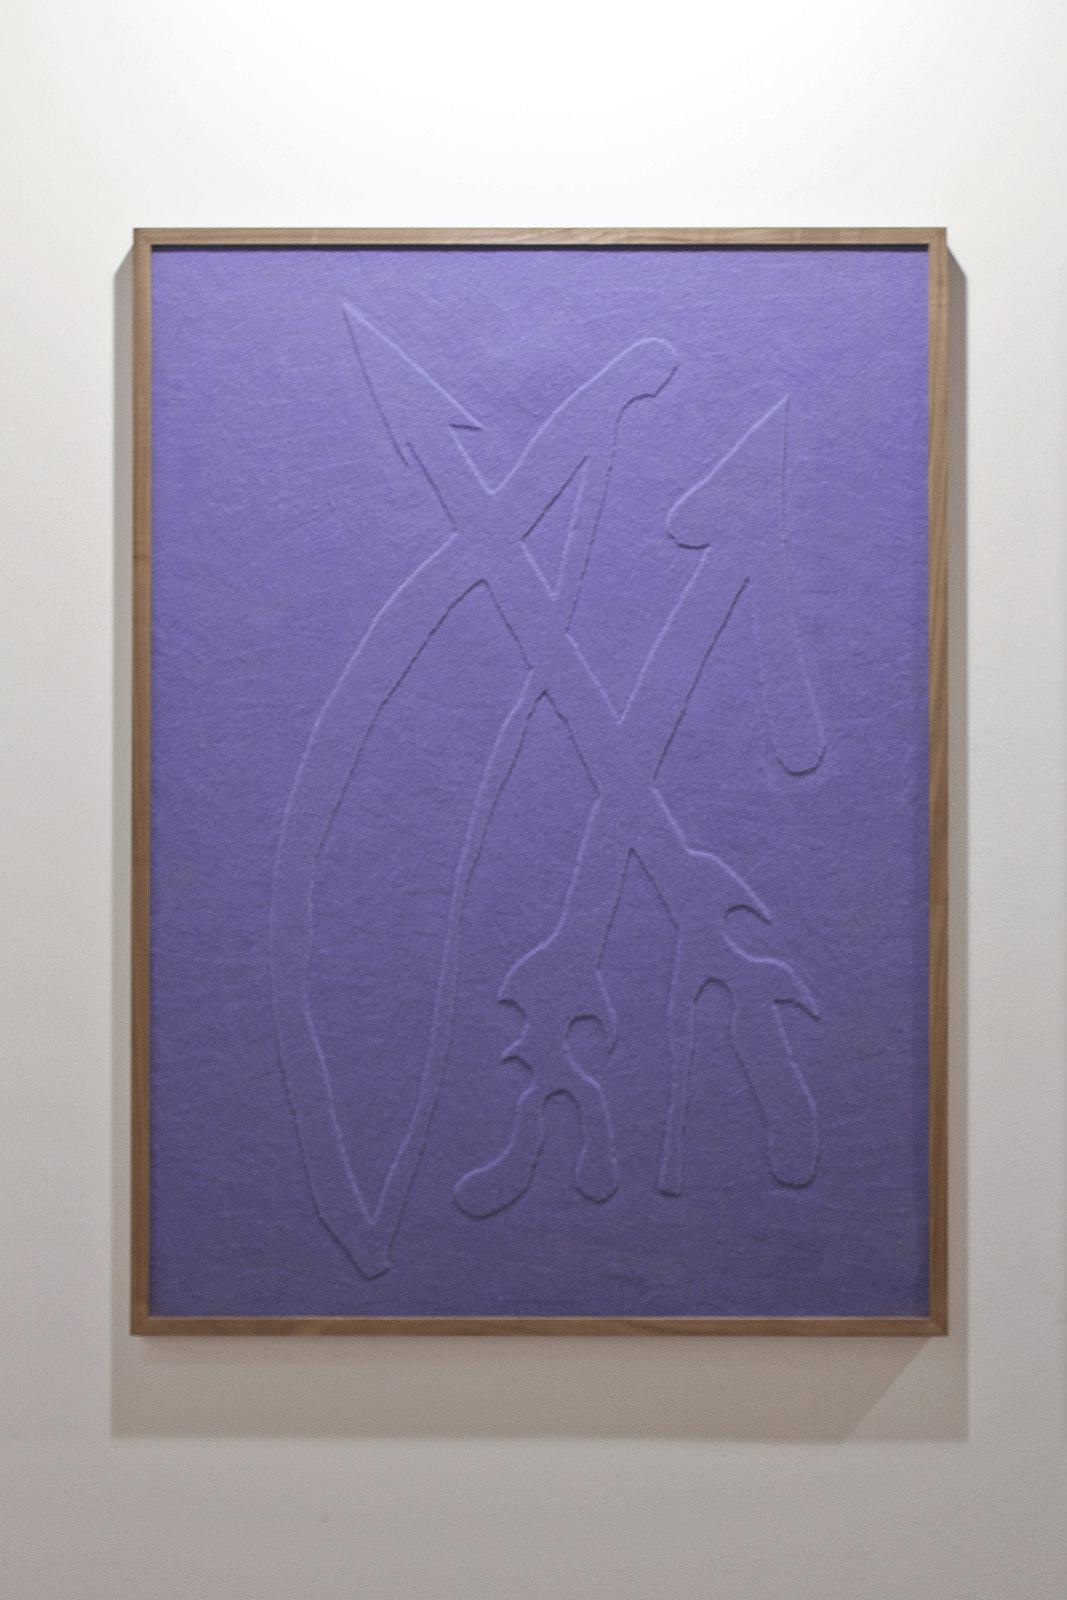 Balz Isler at Galerie Conrandi, Hamburg 02